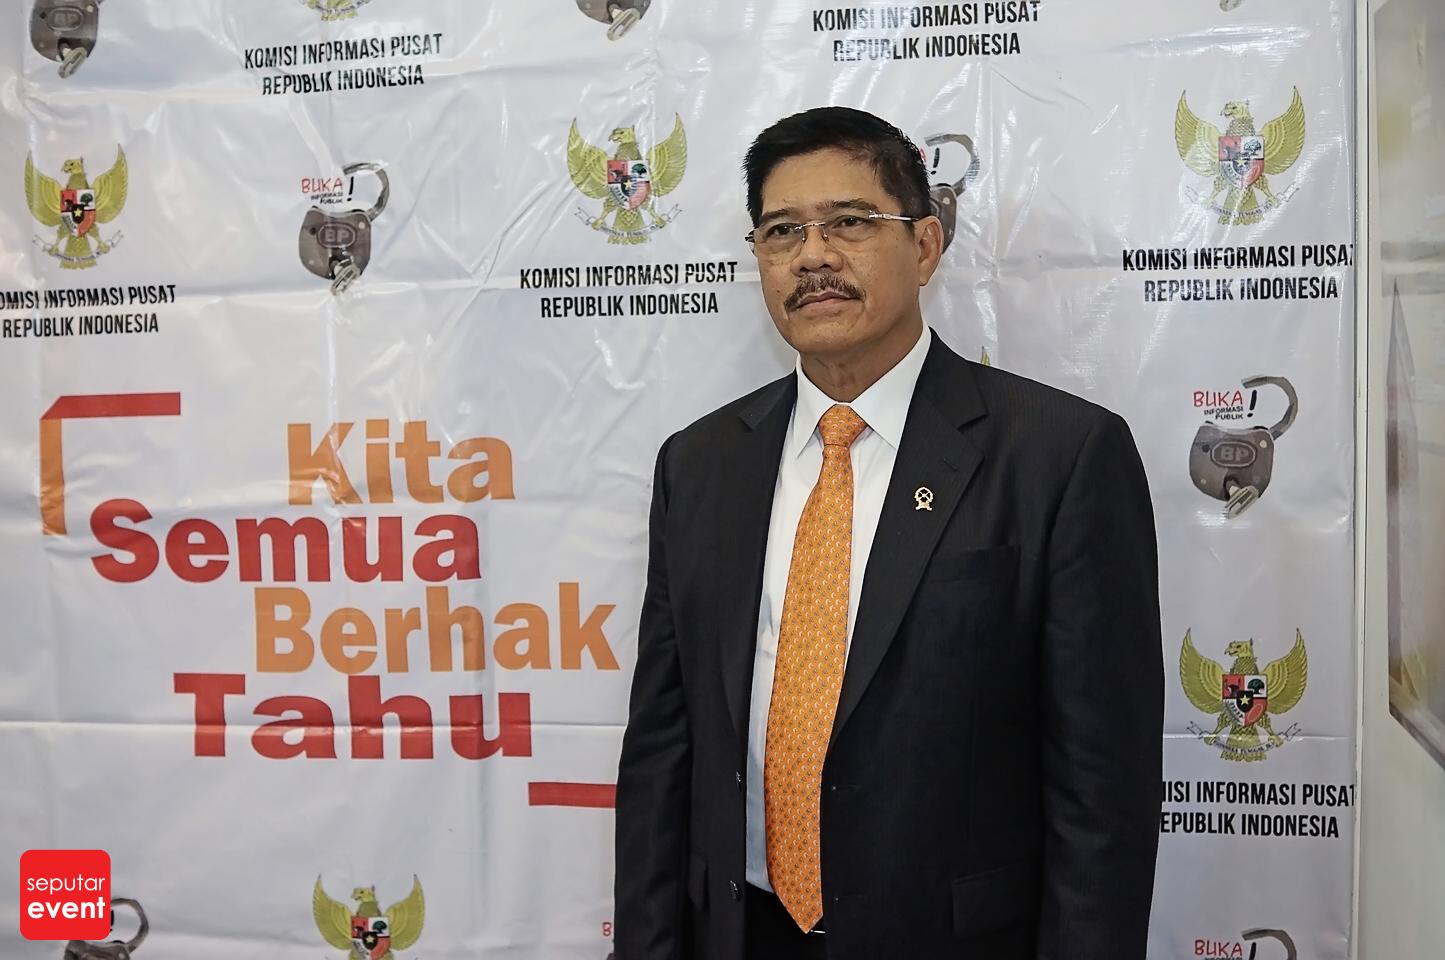 Kampung Hukum MA 2015 (15).JPG